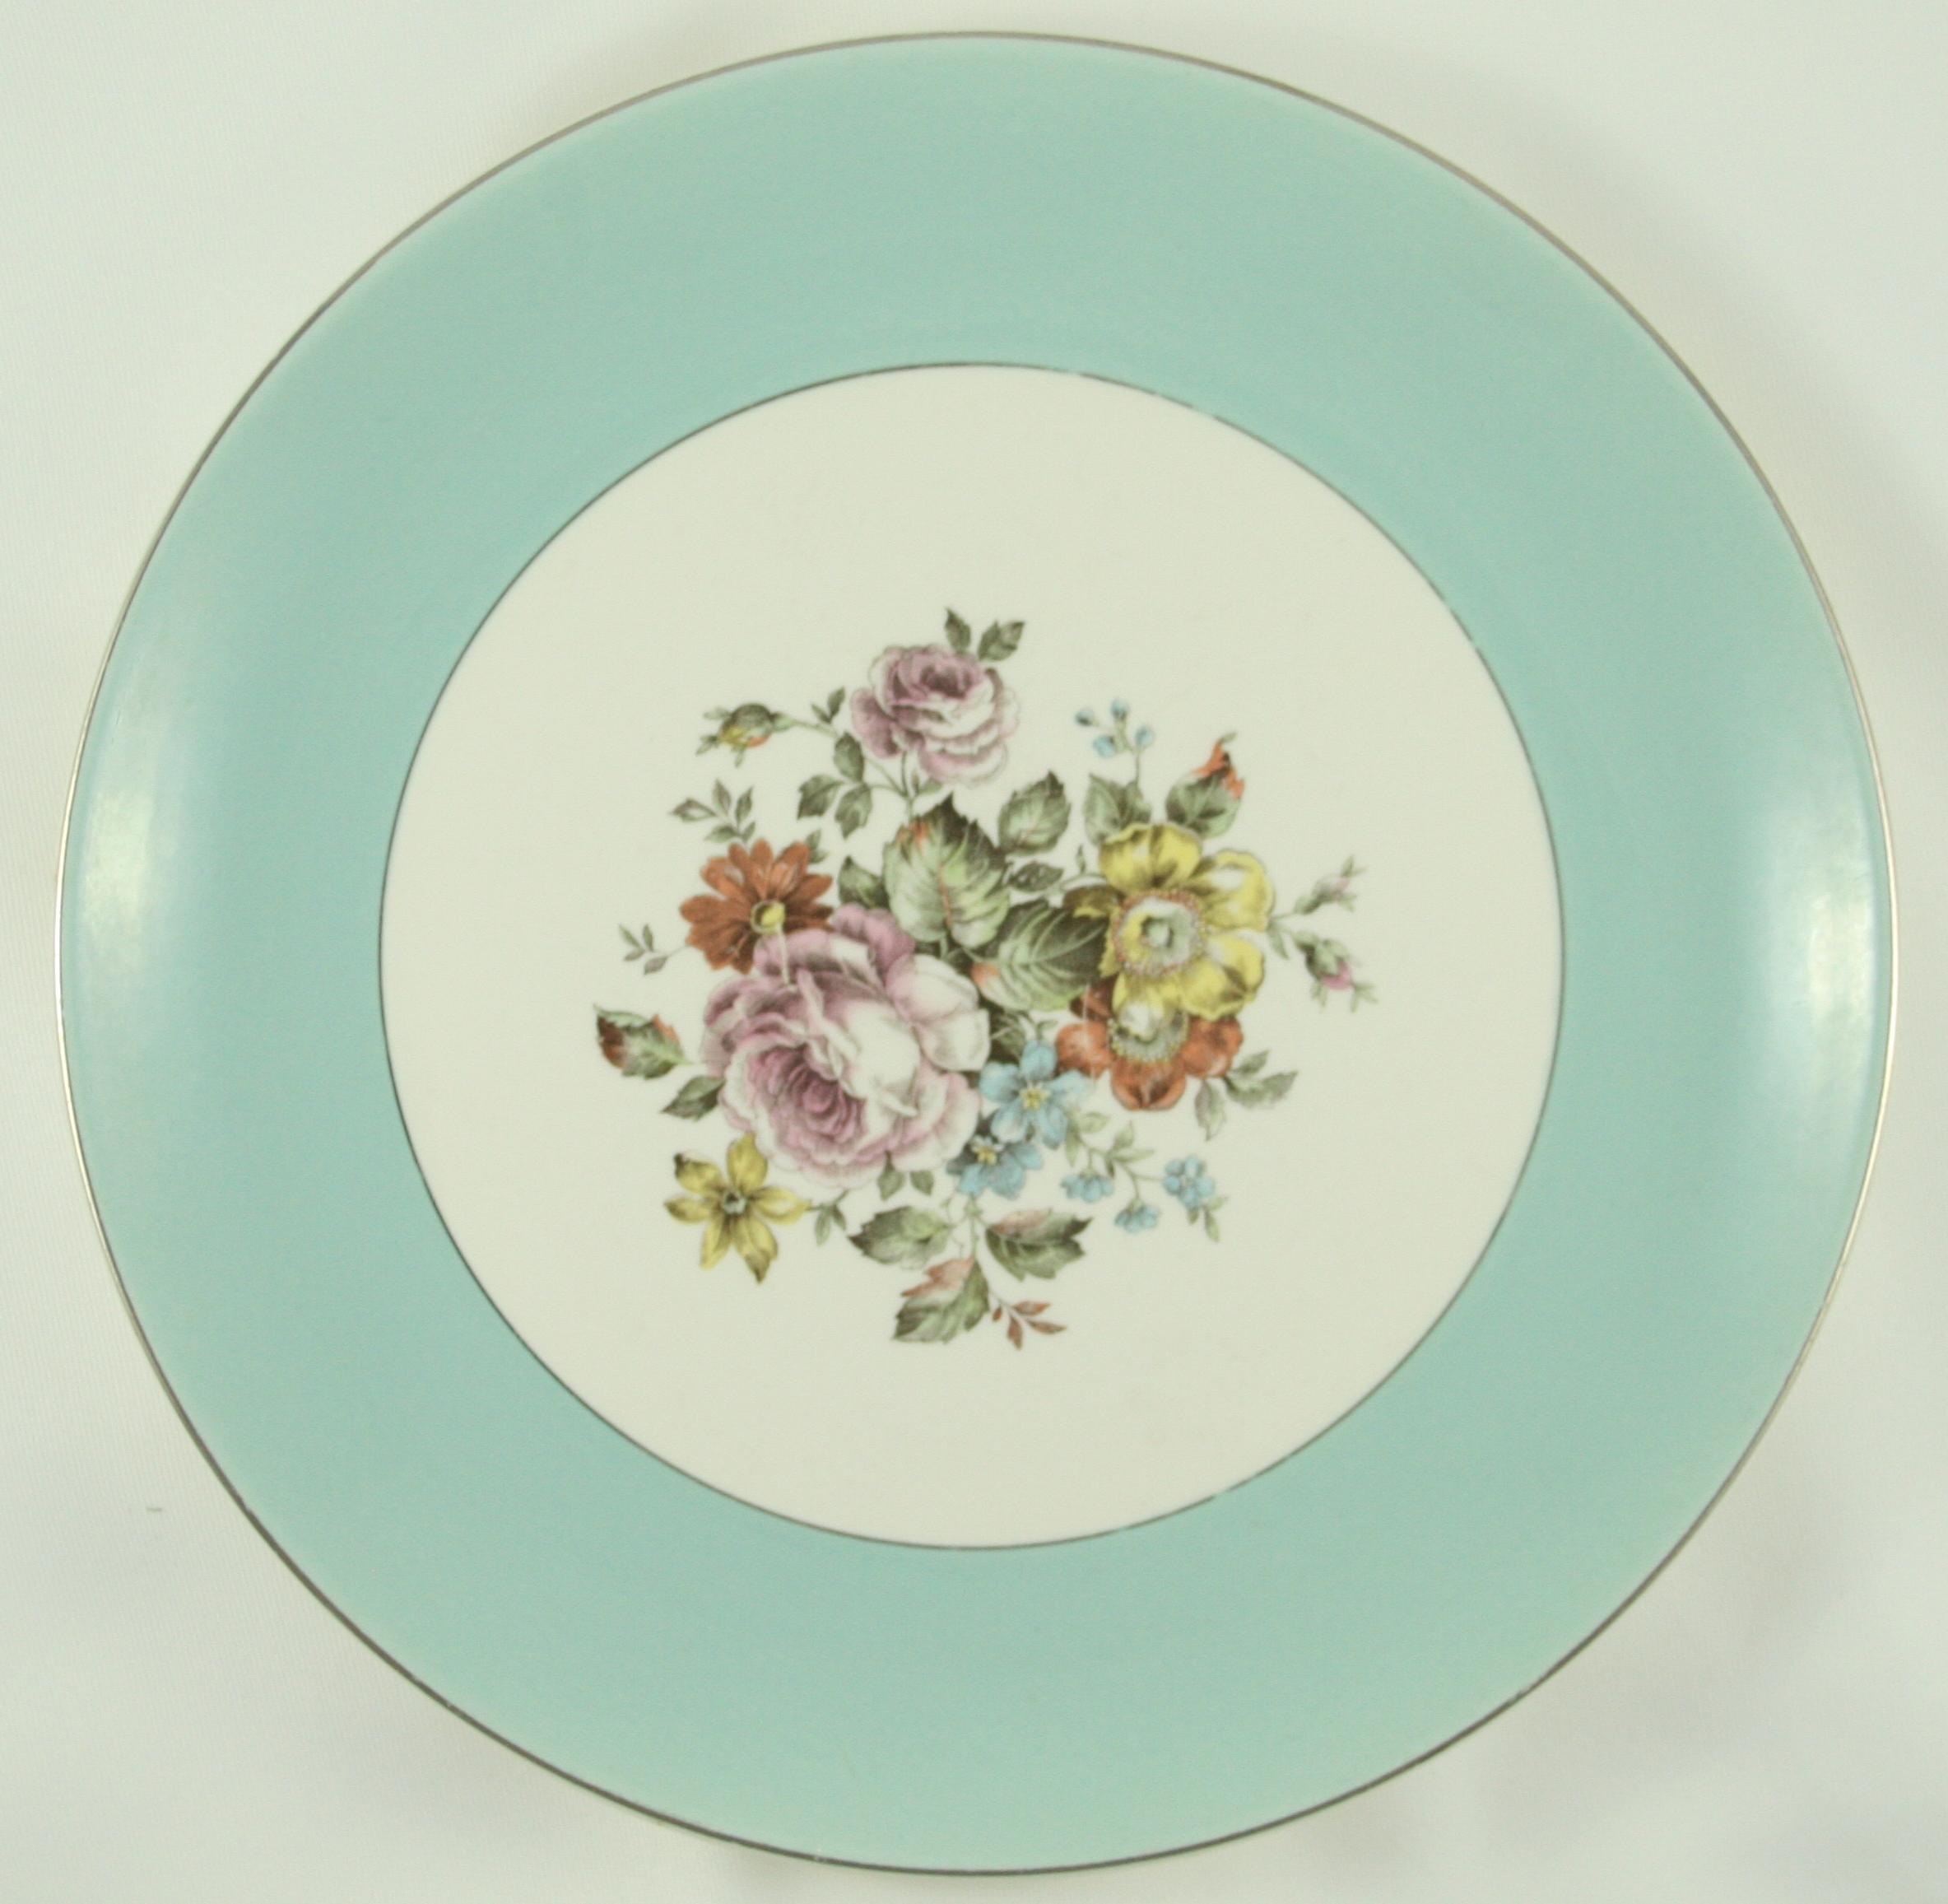 Vintage blue china plate